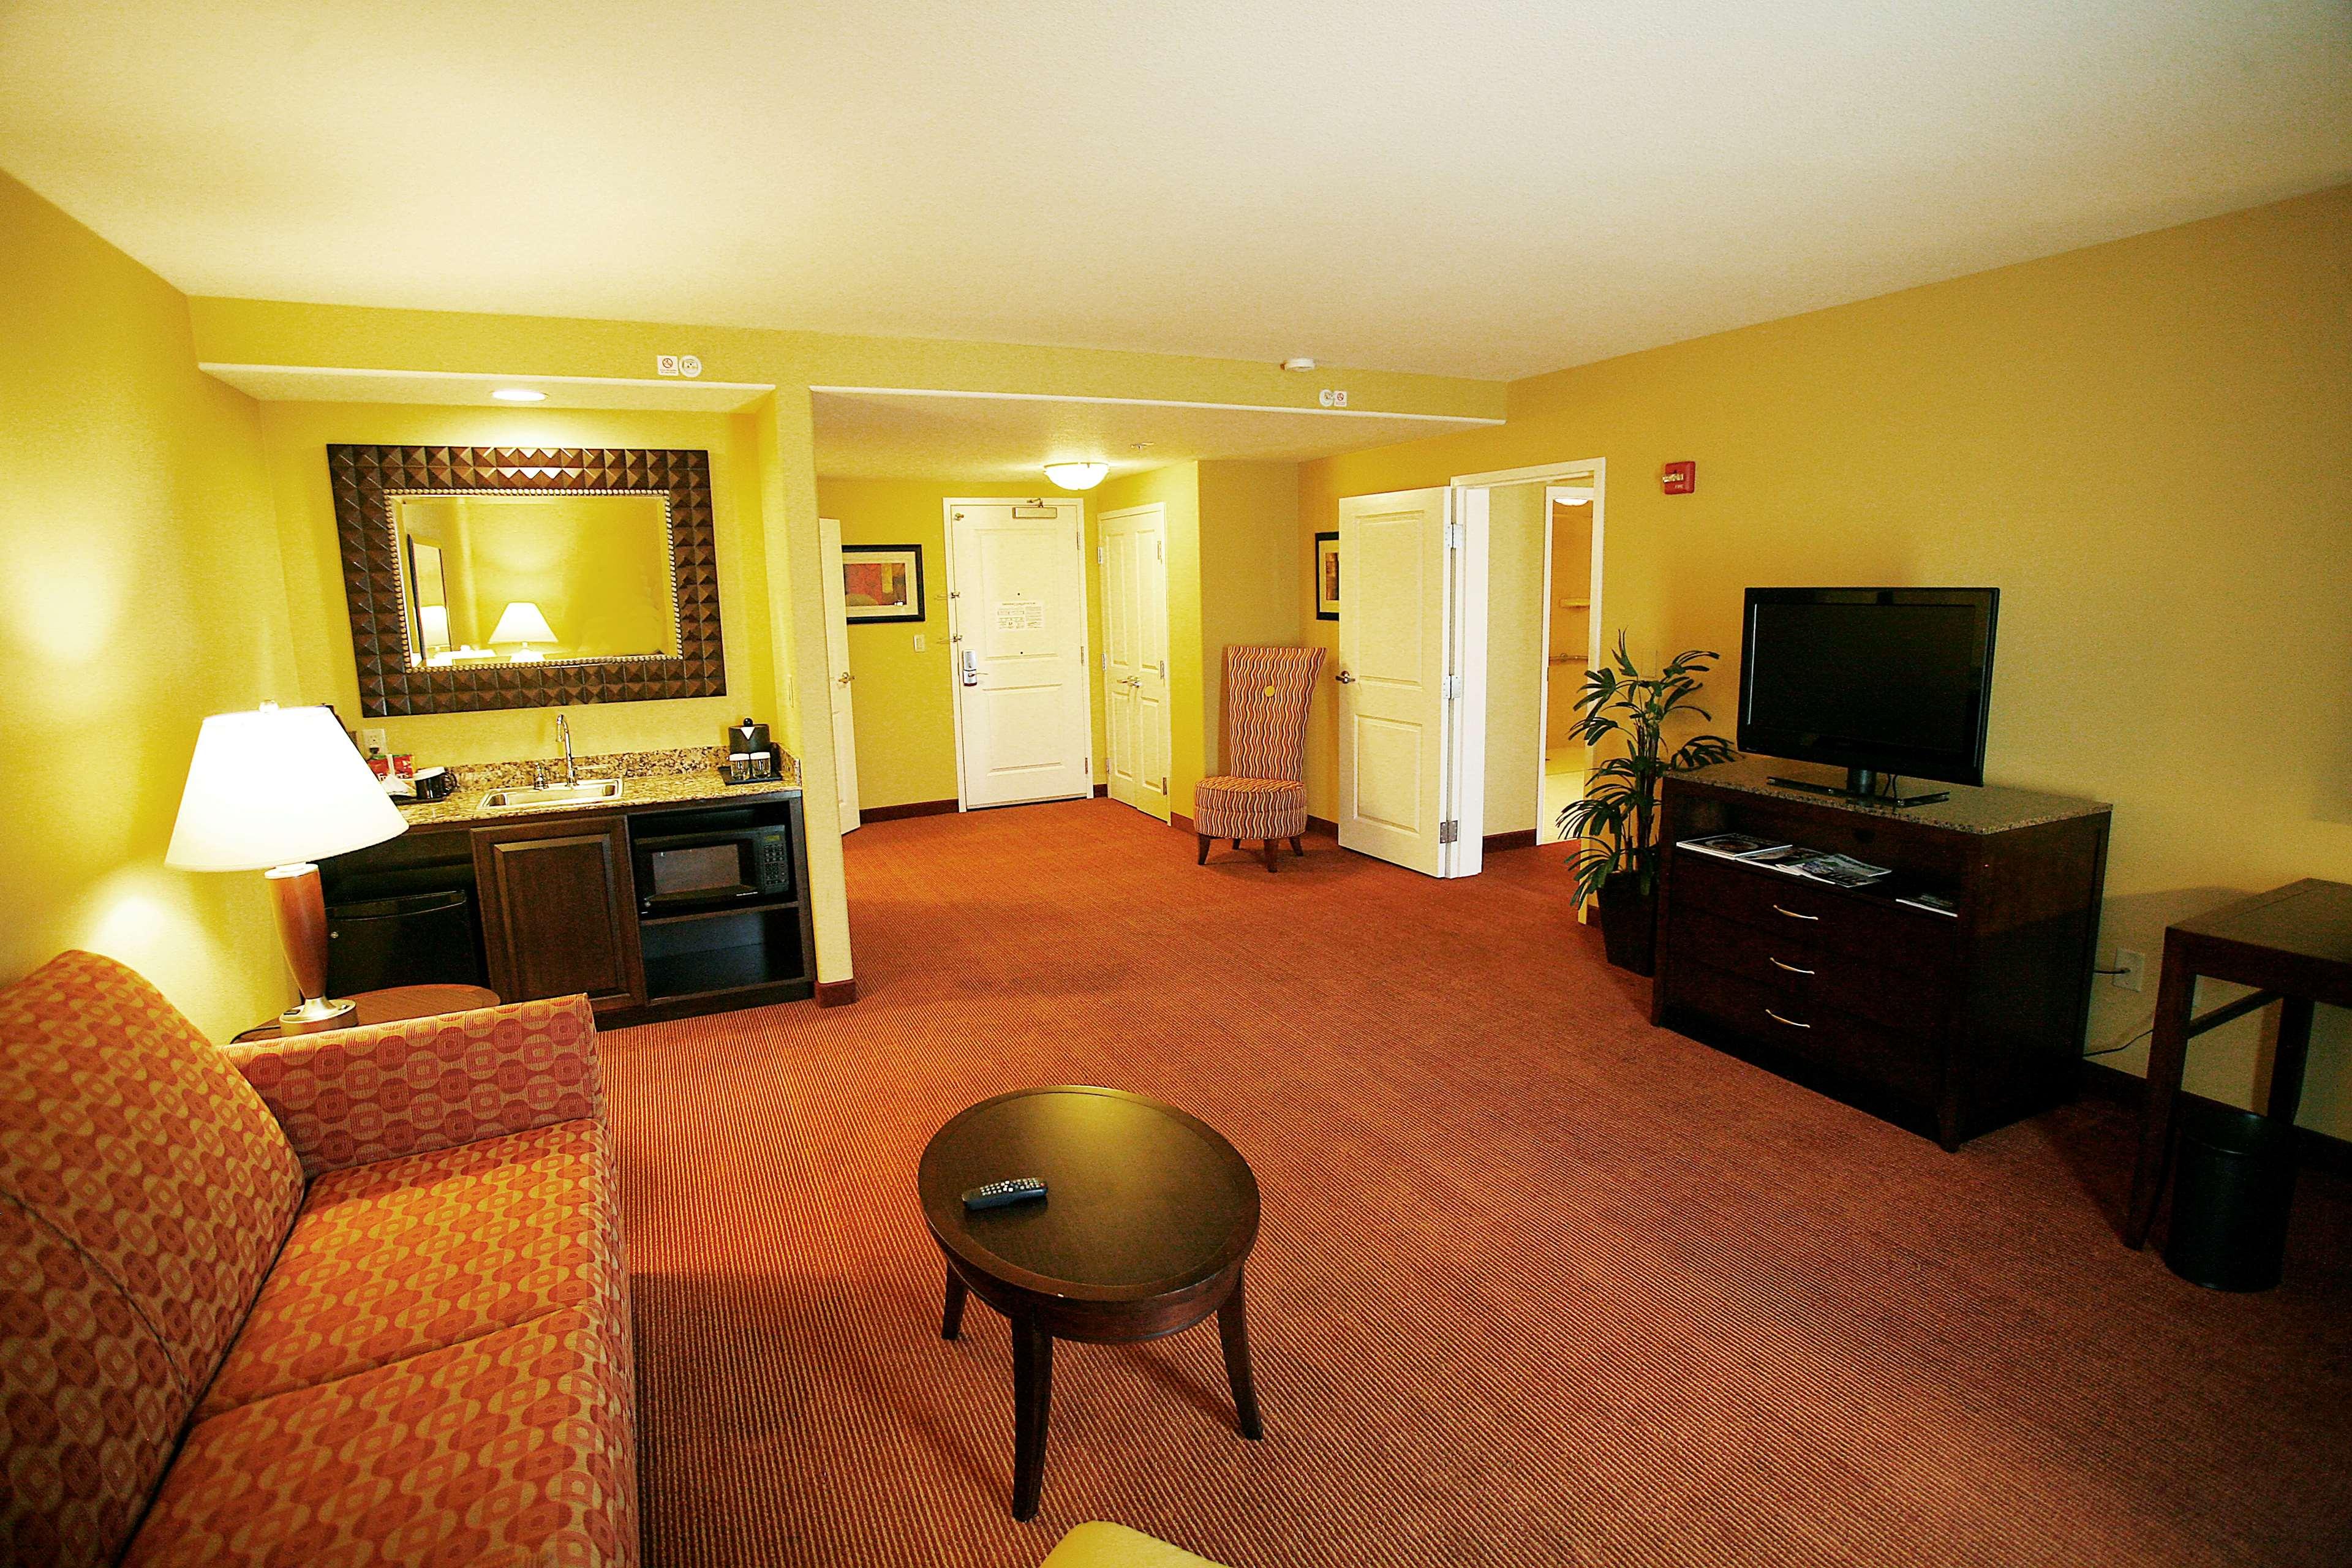 Hilton Garden Inn Fontana image 8